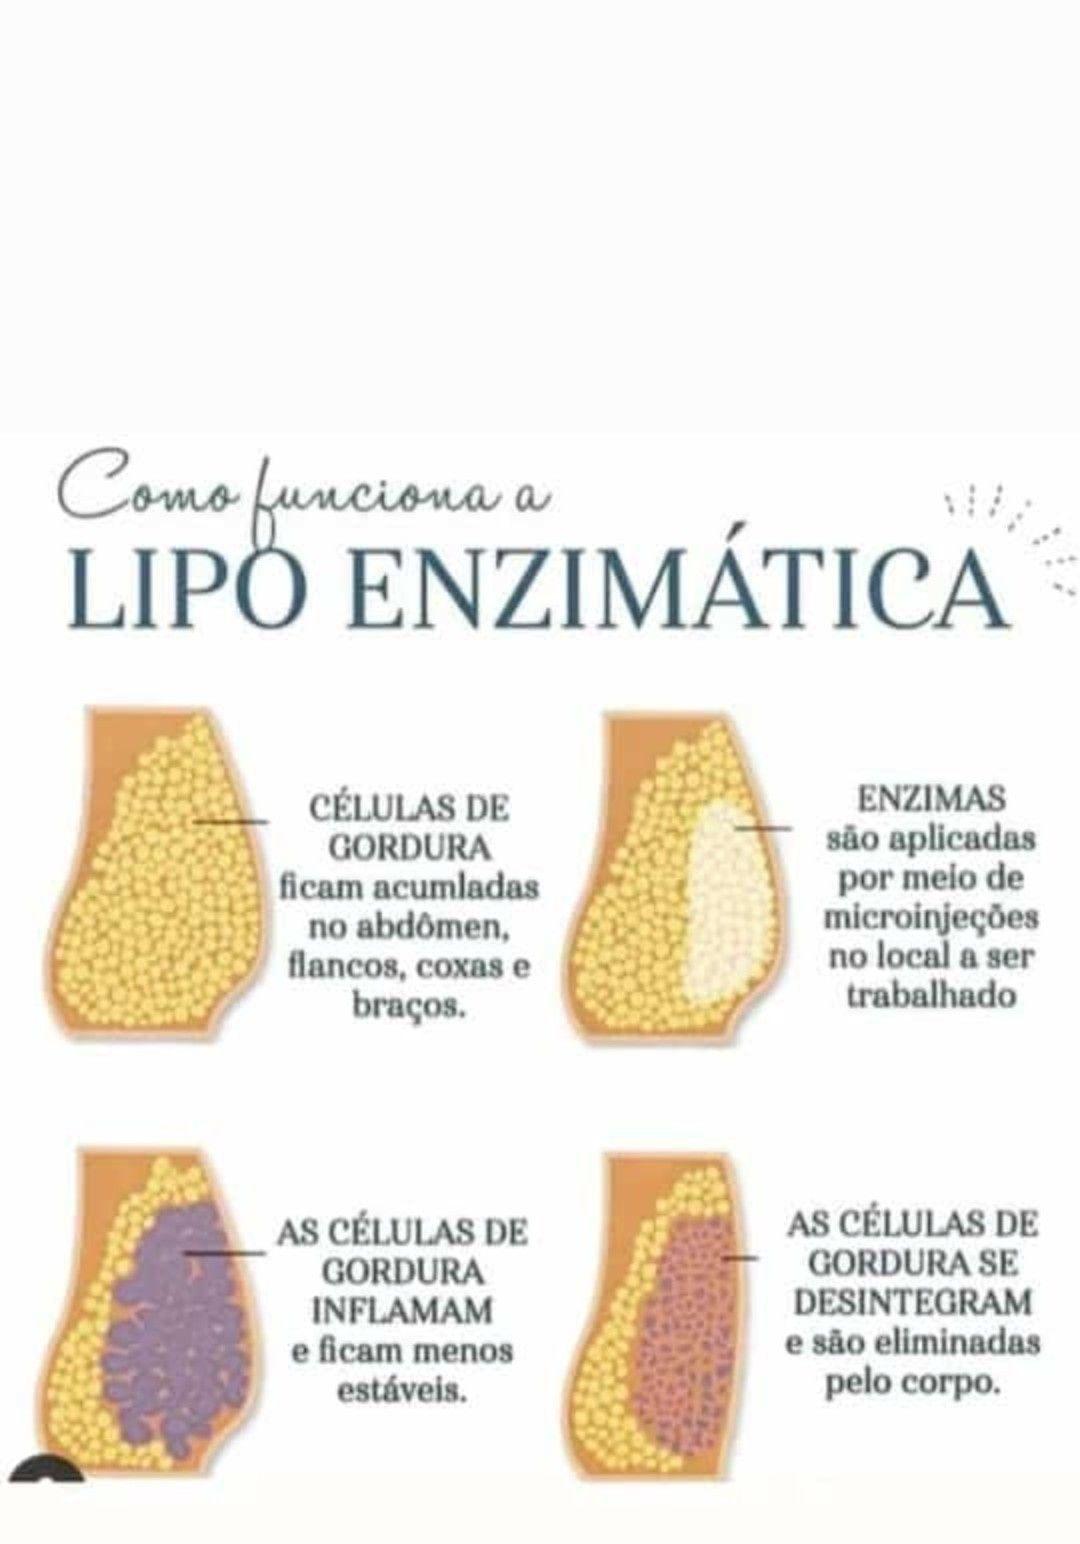 LIPO ENZIMÁTICA